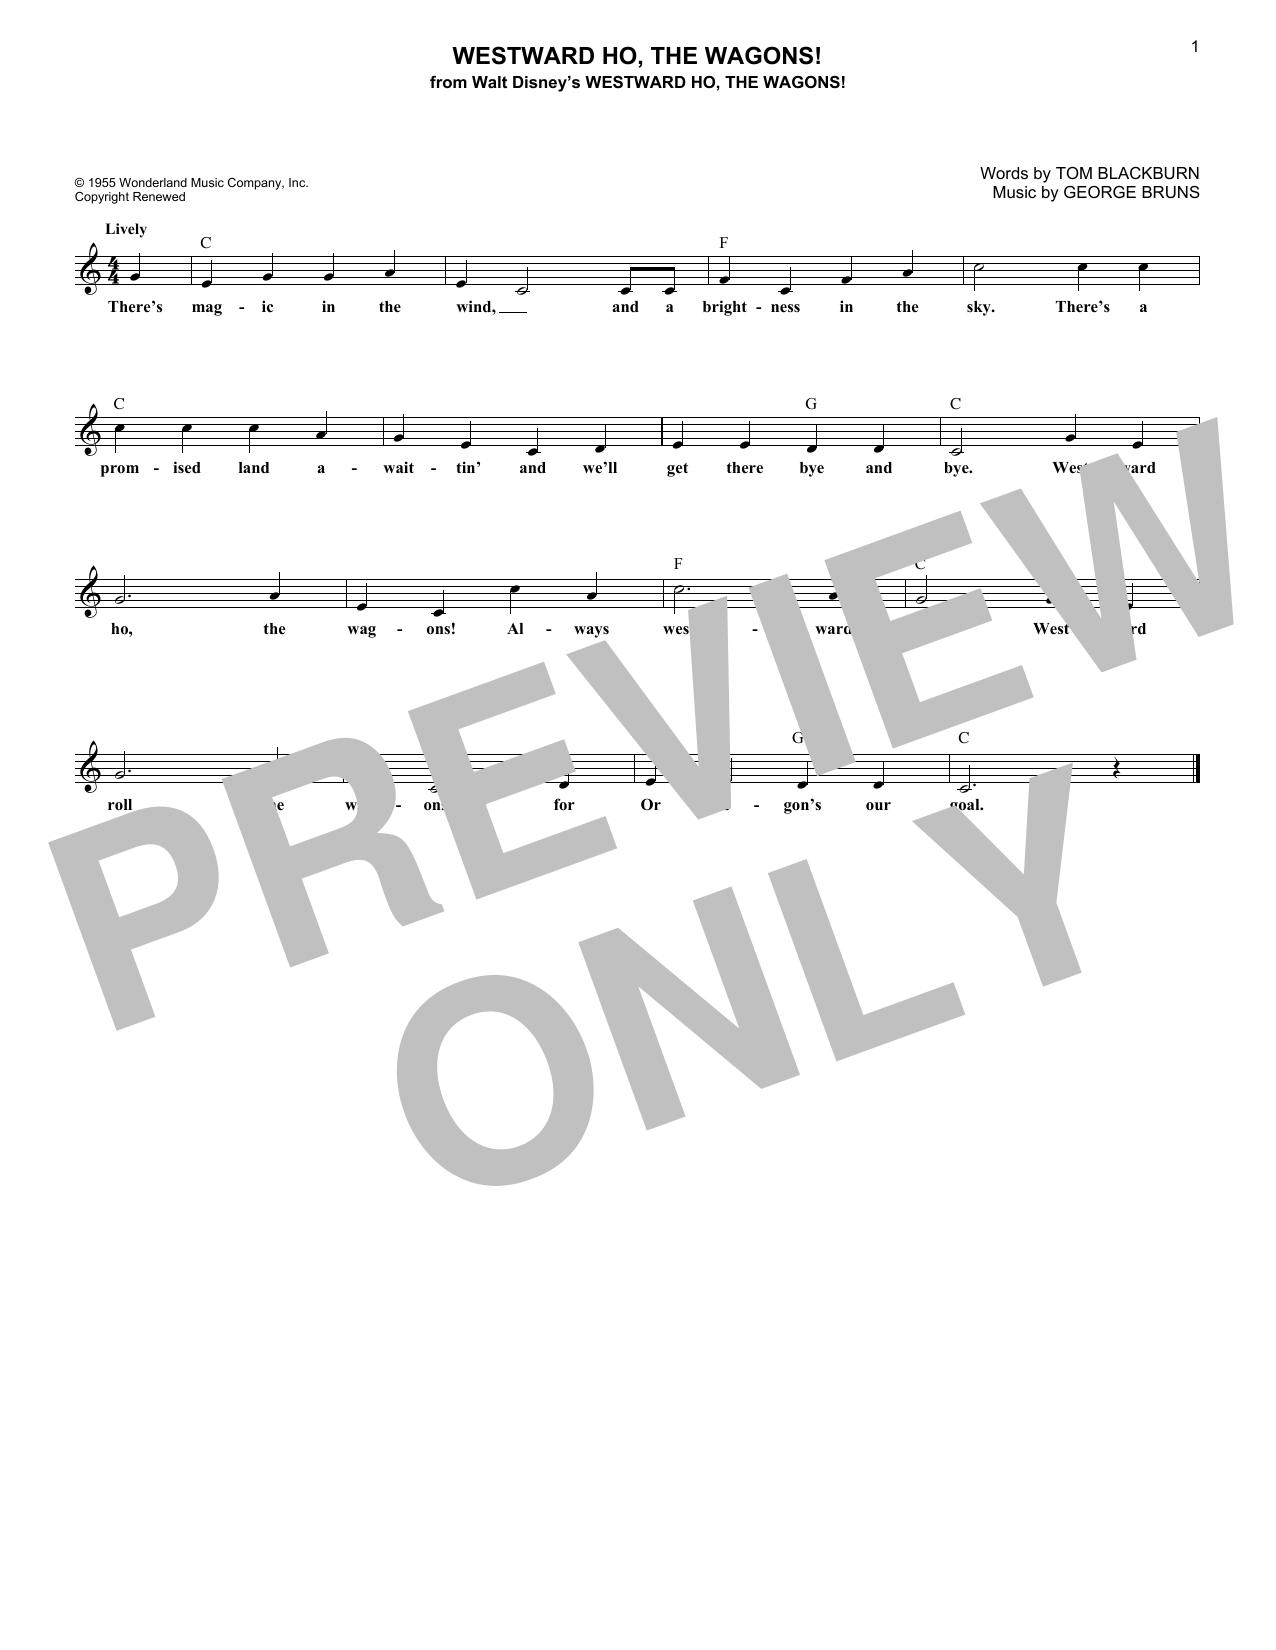 Tom Blackburn Westward Ho, The Wagons! sheet music notes and chords. Download Printable PDF.